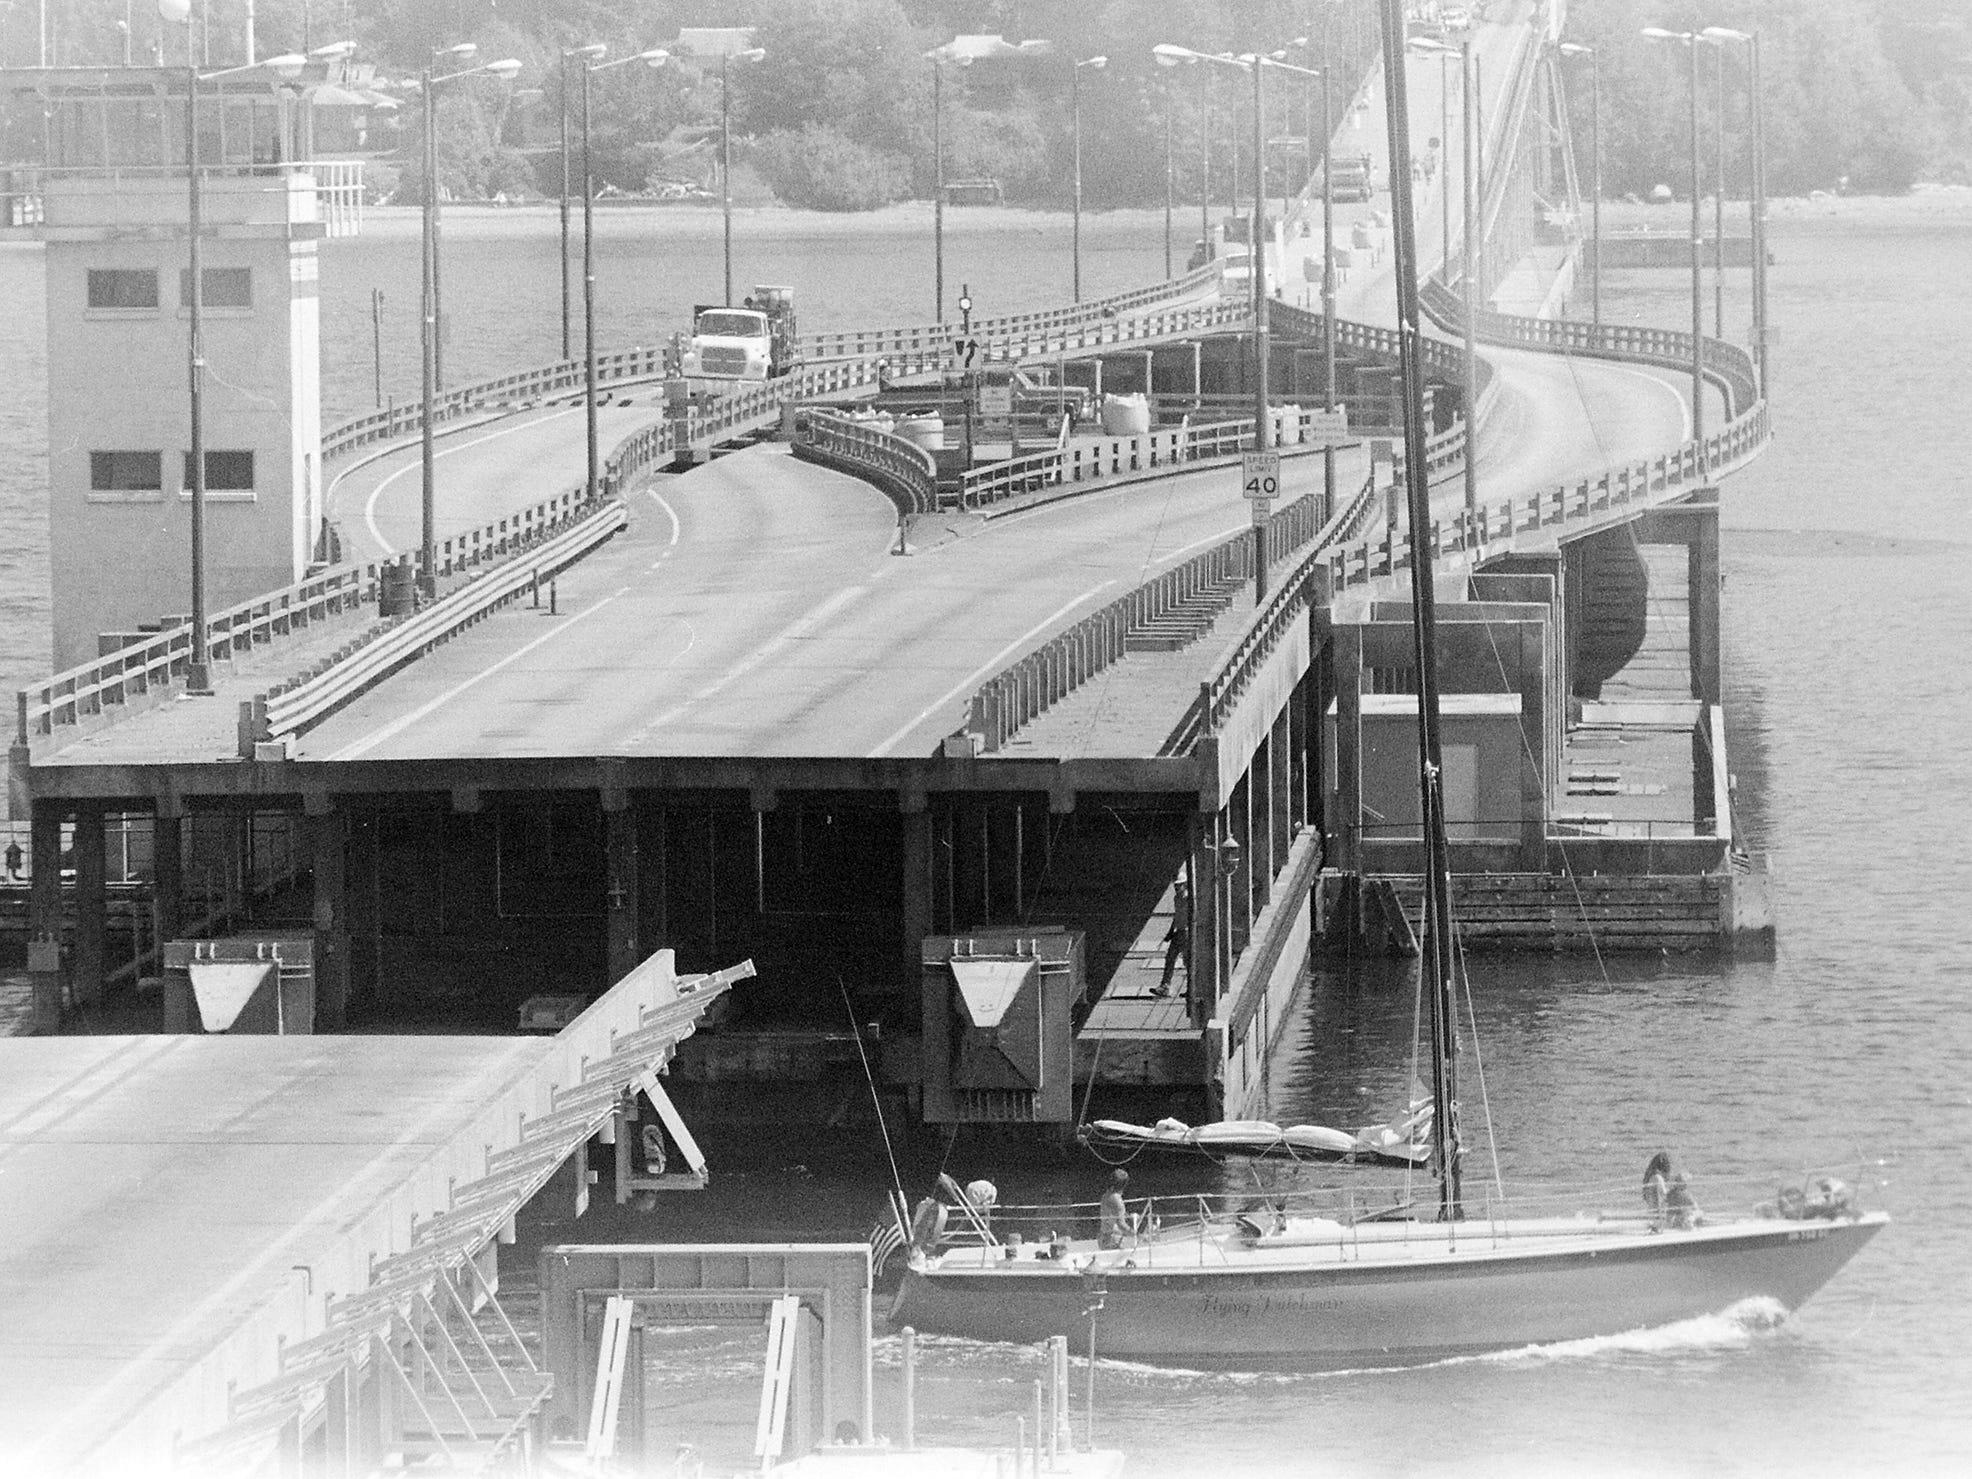 07/20/88Hood Canal Bridge